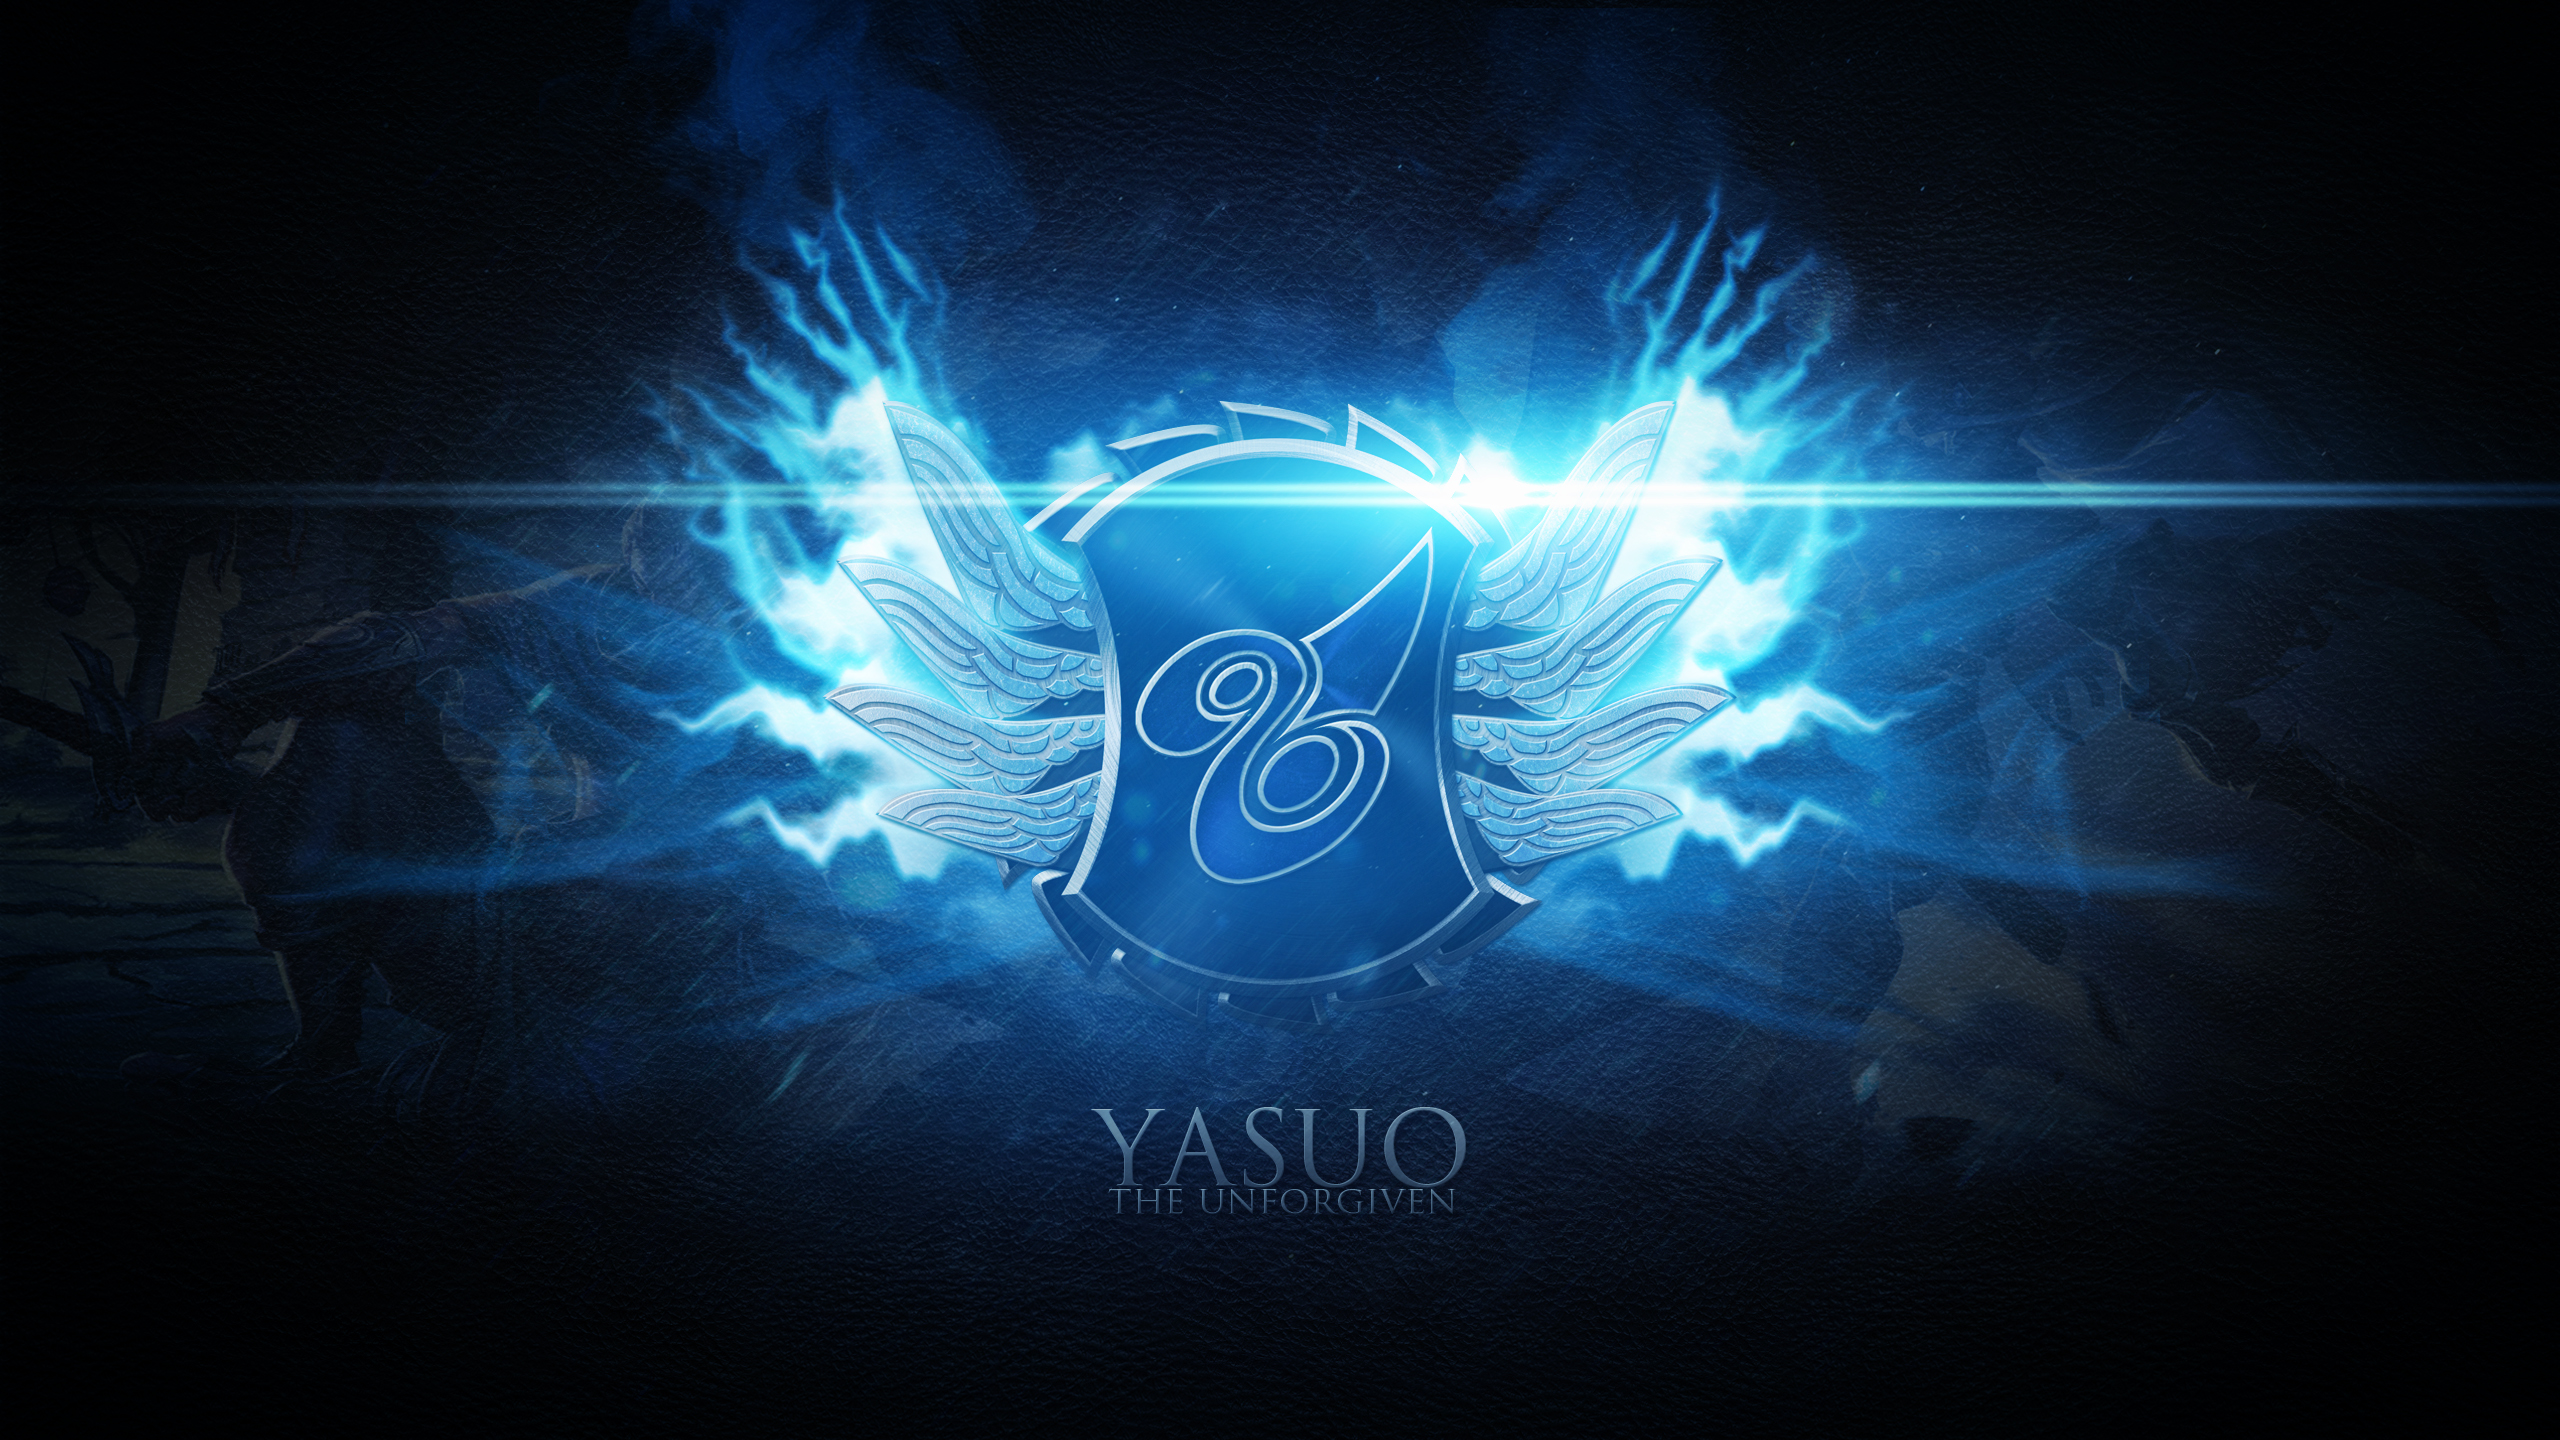 yasuo_wallpaper_by_theextraqt-d7nr2e7